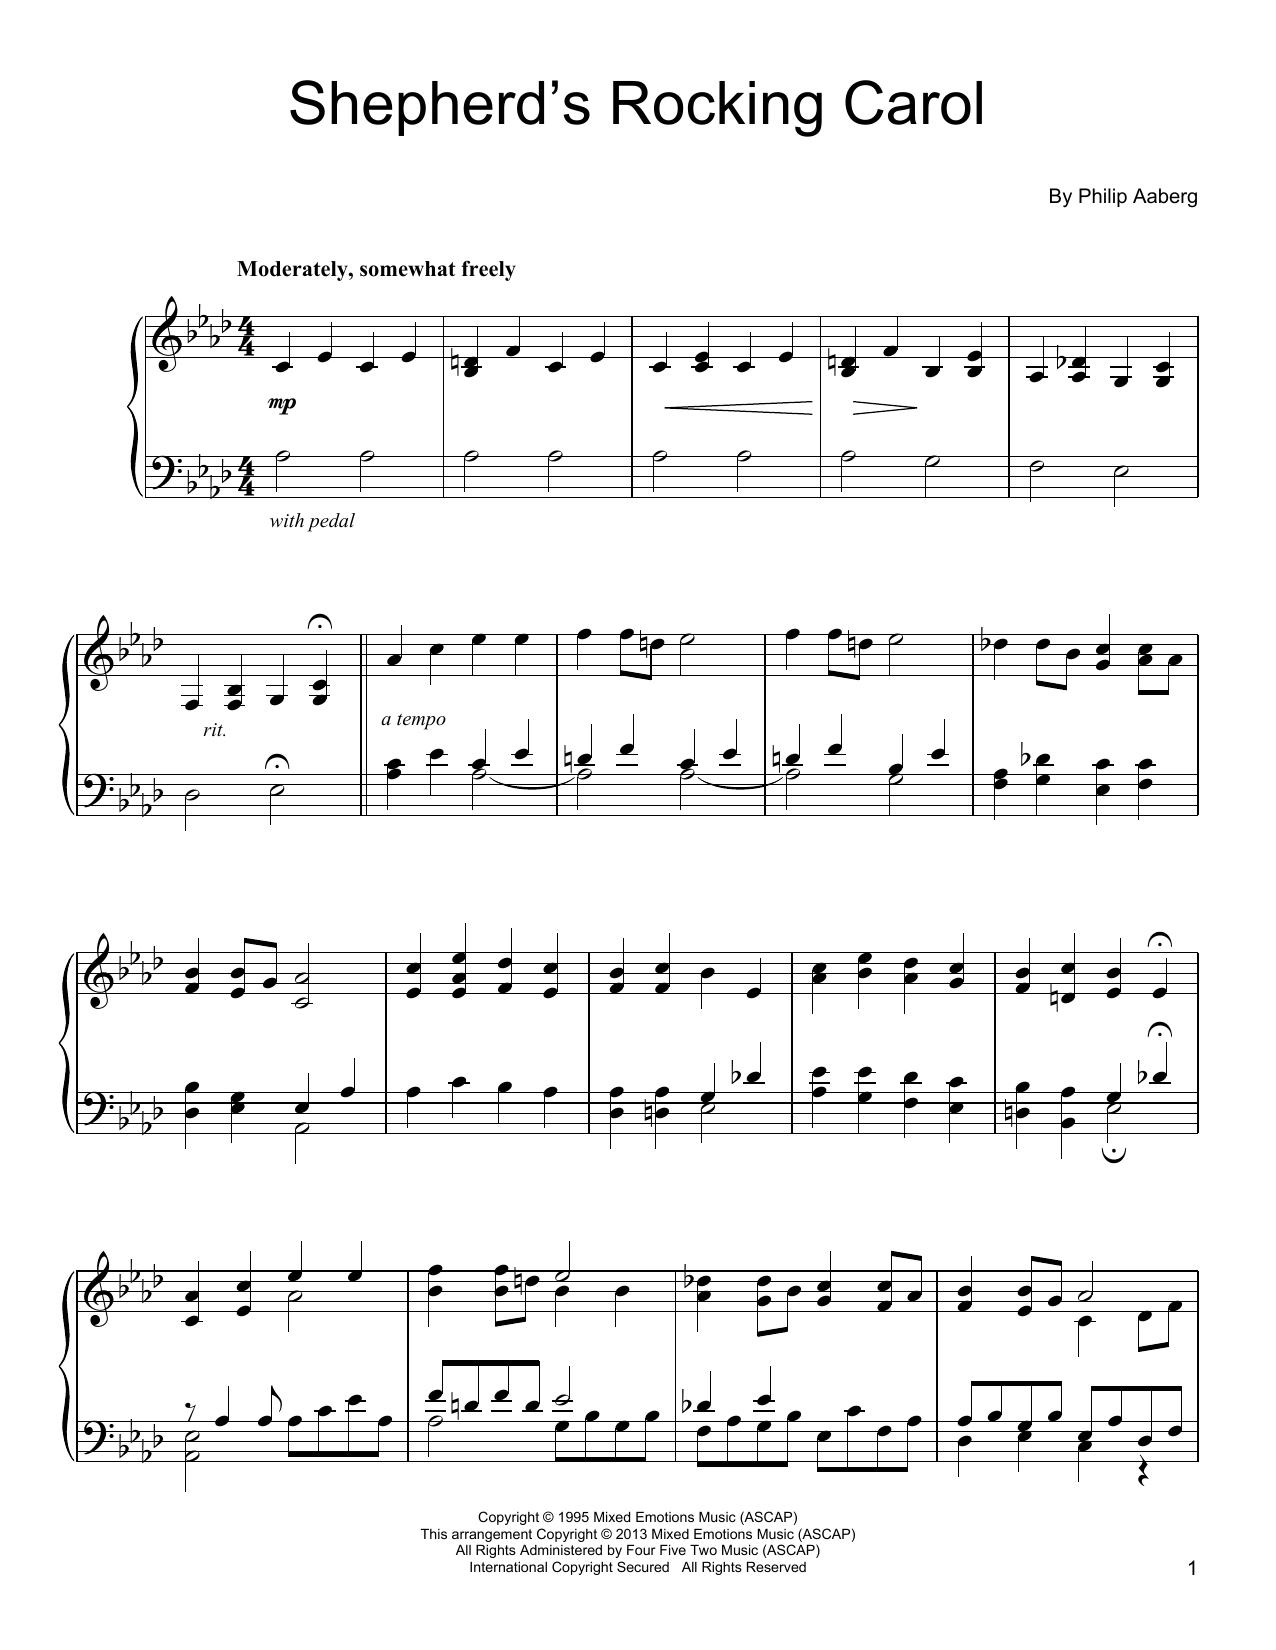 Philip Aaberg Shepherd's Rocking Carol sheet music notes and chords. Download Printable PDF.